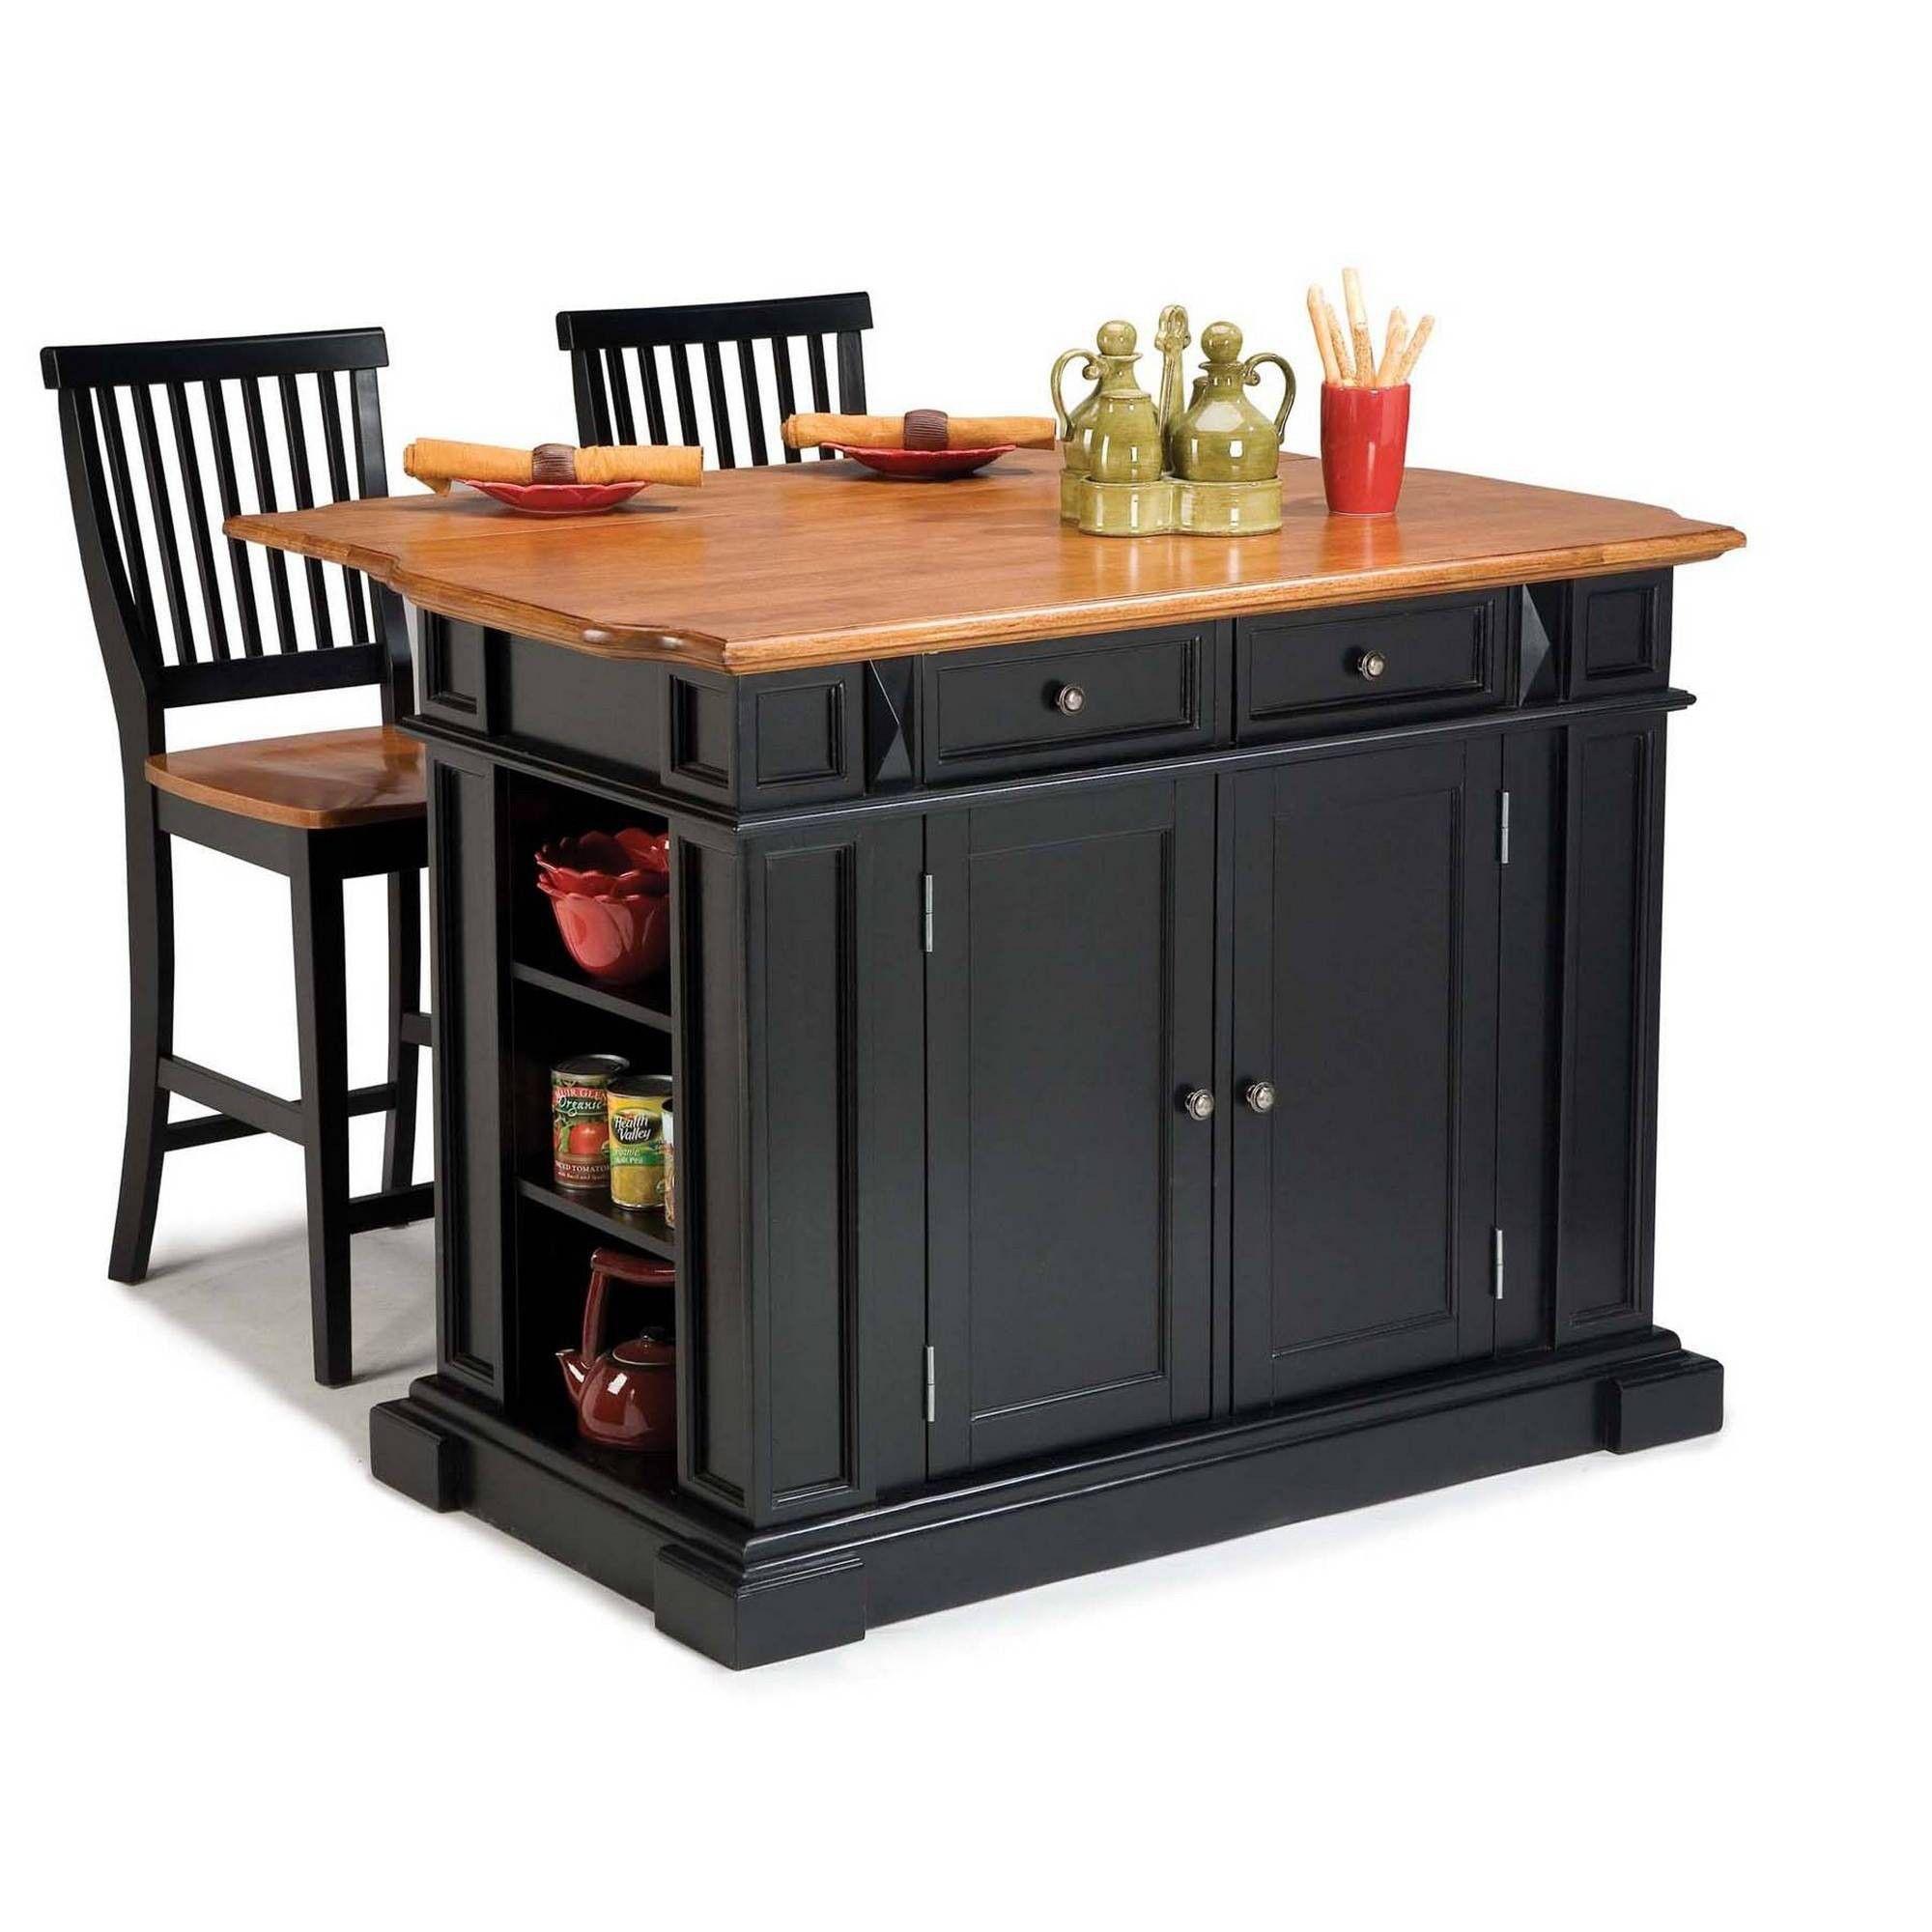 Kitchen Island And Stool Set Black Oak Home Styles In 2020 Kitchen Furniture Kitchen Seating Kitchen Island Bar